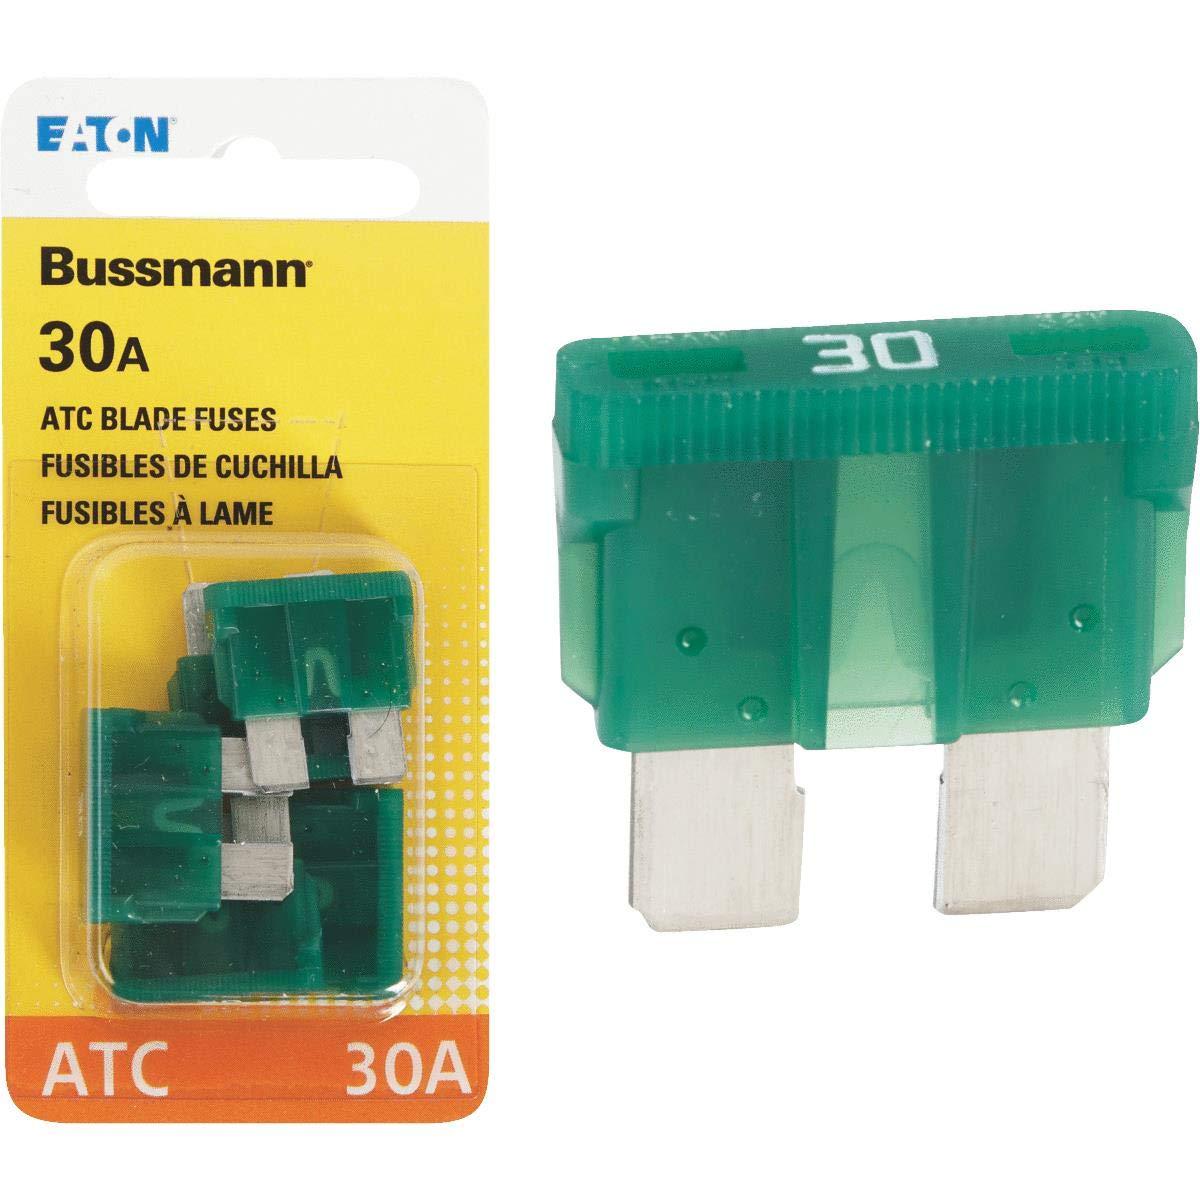 30 Amp ATC Blade Fuse Bussmann Pack of 5 BP//ATC-30-RP